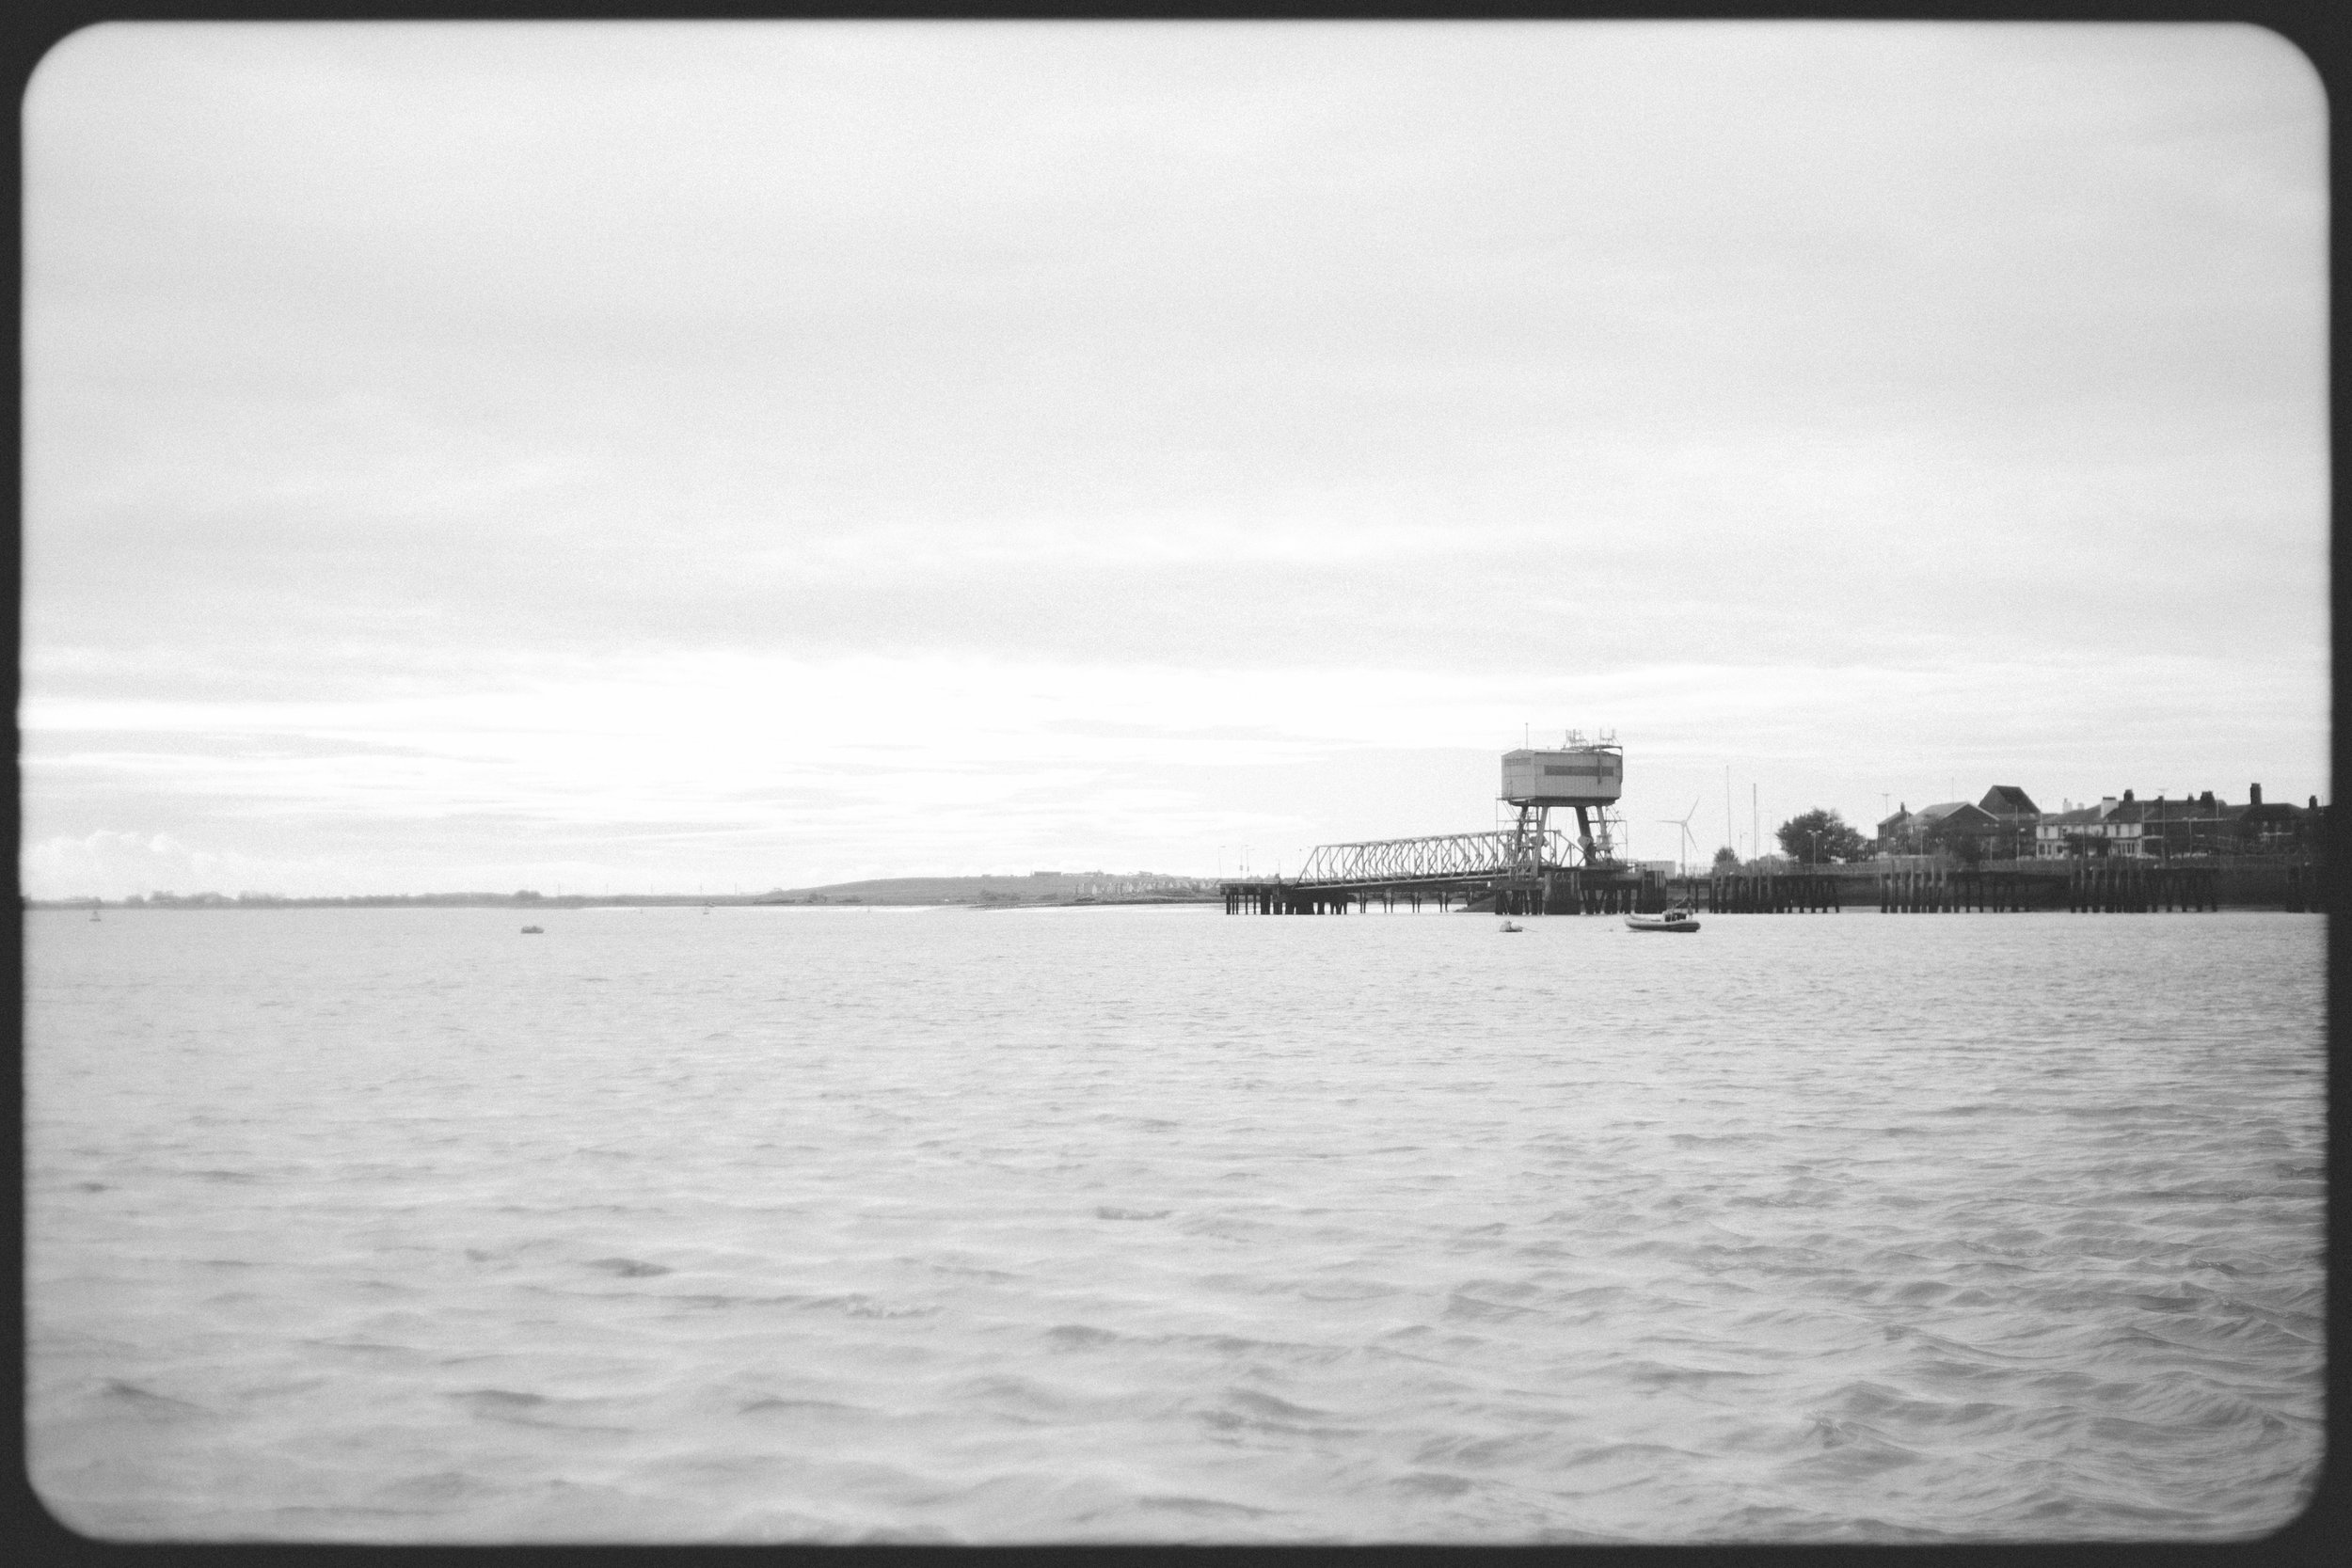 Fleetwood ferry (1 of 3).jpg